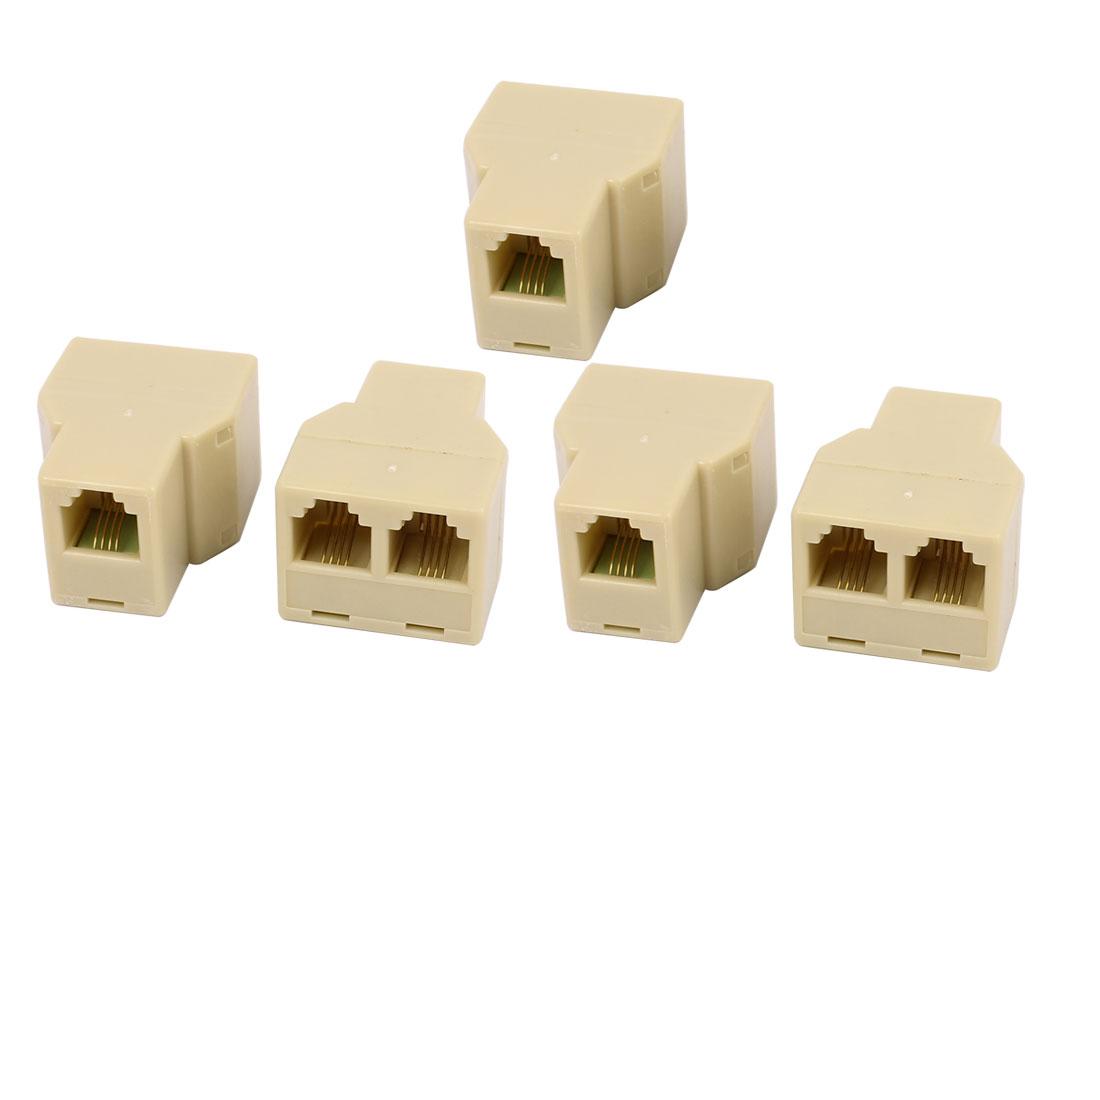 RJ11 4 Pins 1 Female to 2 Female Telephone Splitter Connector Adapter 5 Pcs